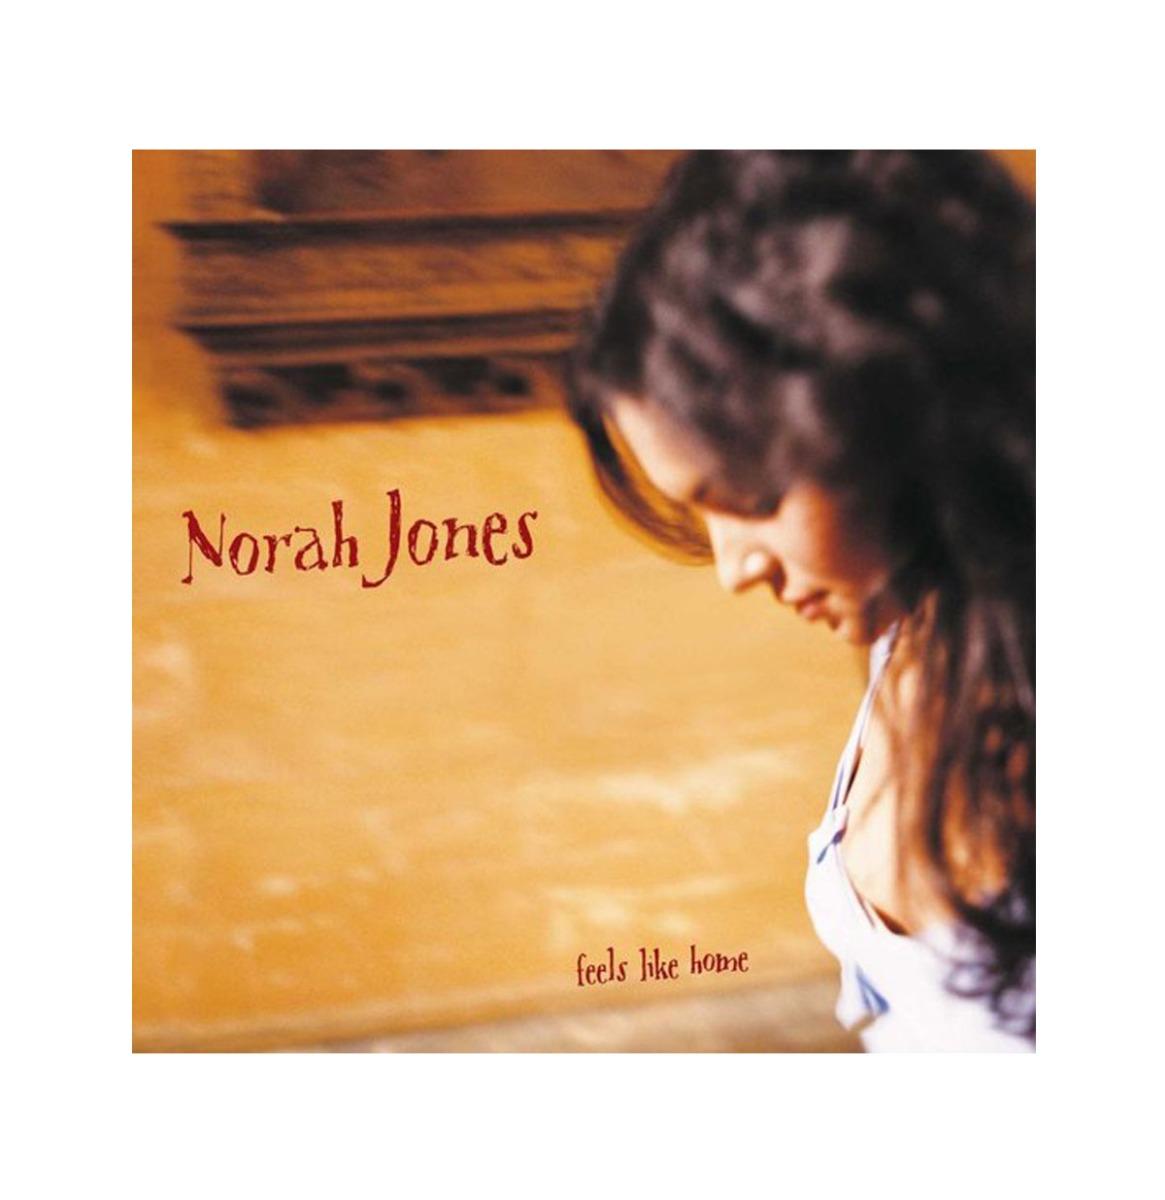 Norah Jones - Feels Like Home LP